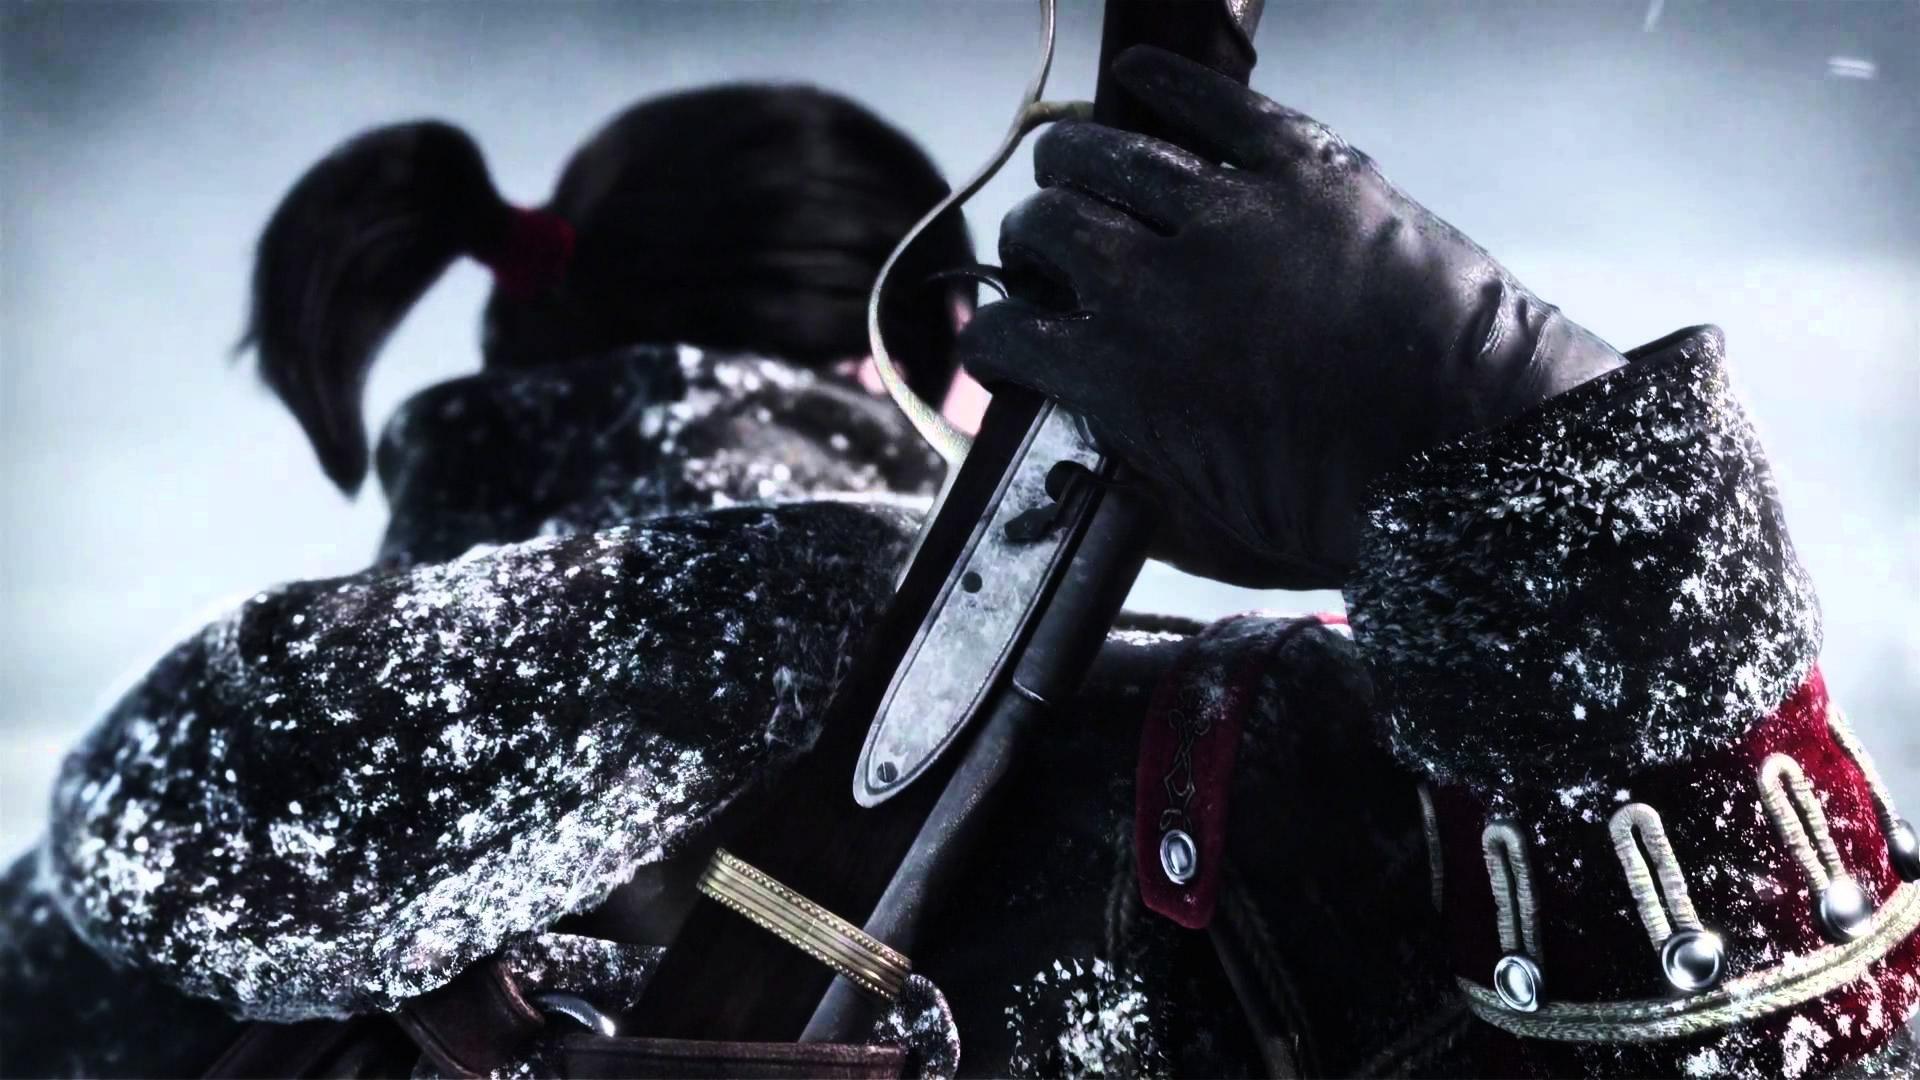 Assassins Creed Wallpaper 1080p: [46+] Assassin's Creed Rogue Wallpaper 1080p On